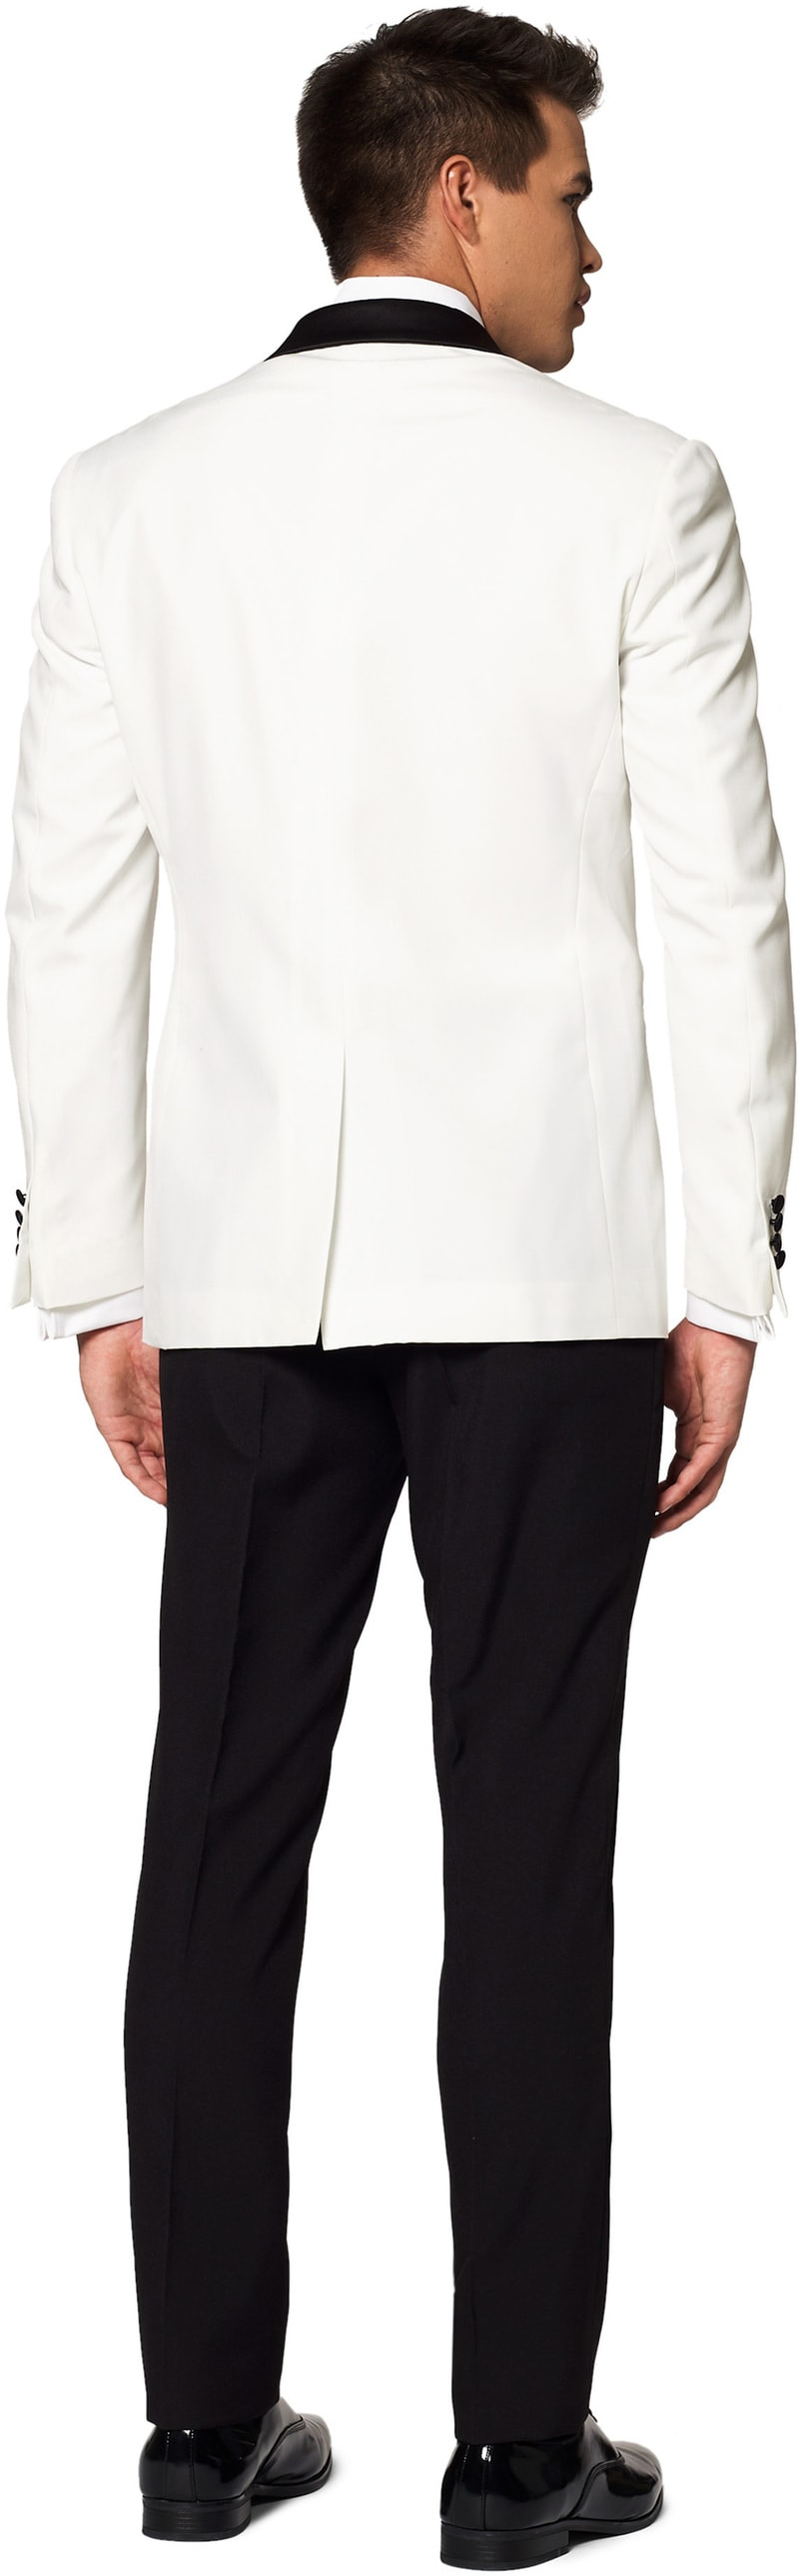 OppoSuits Anzug Pearl White Foto 1